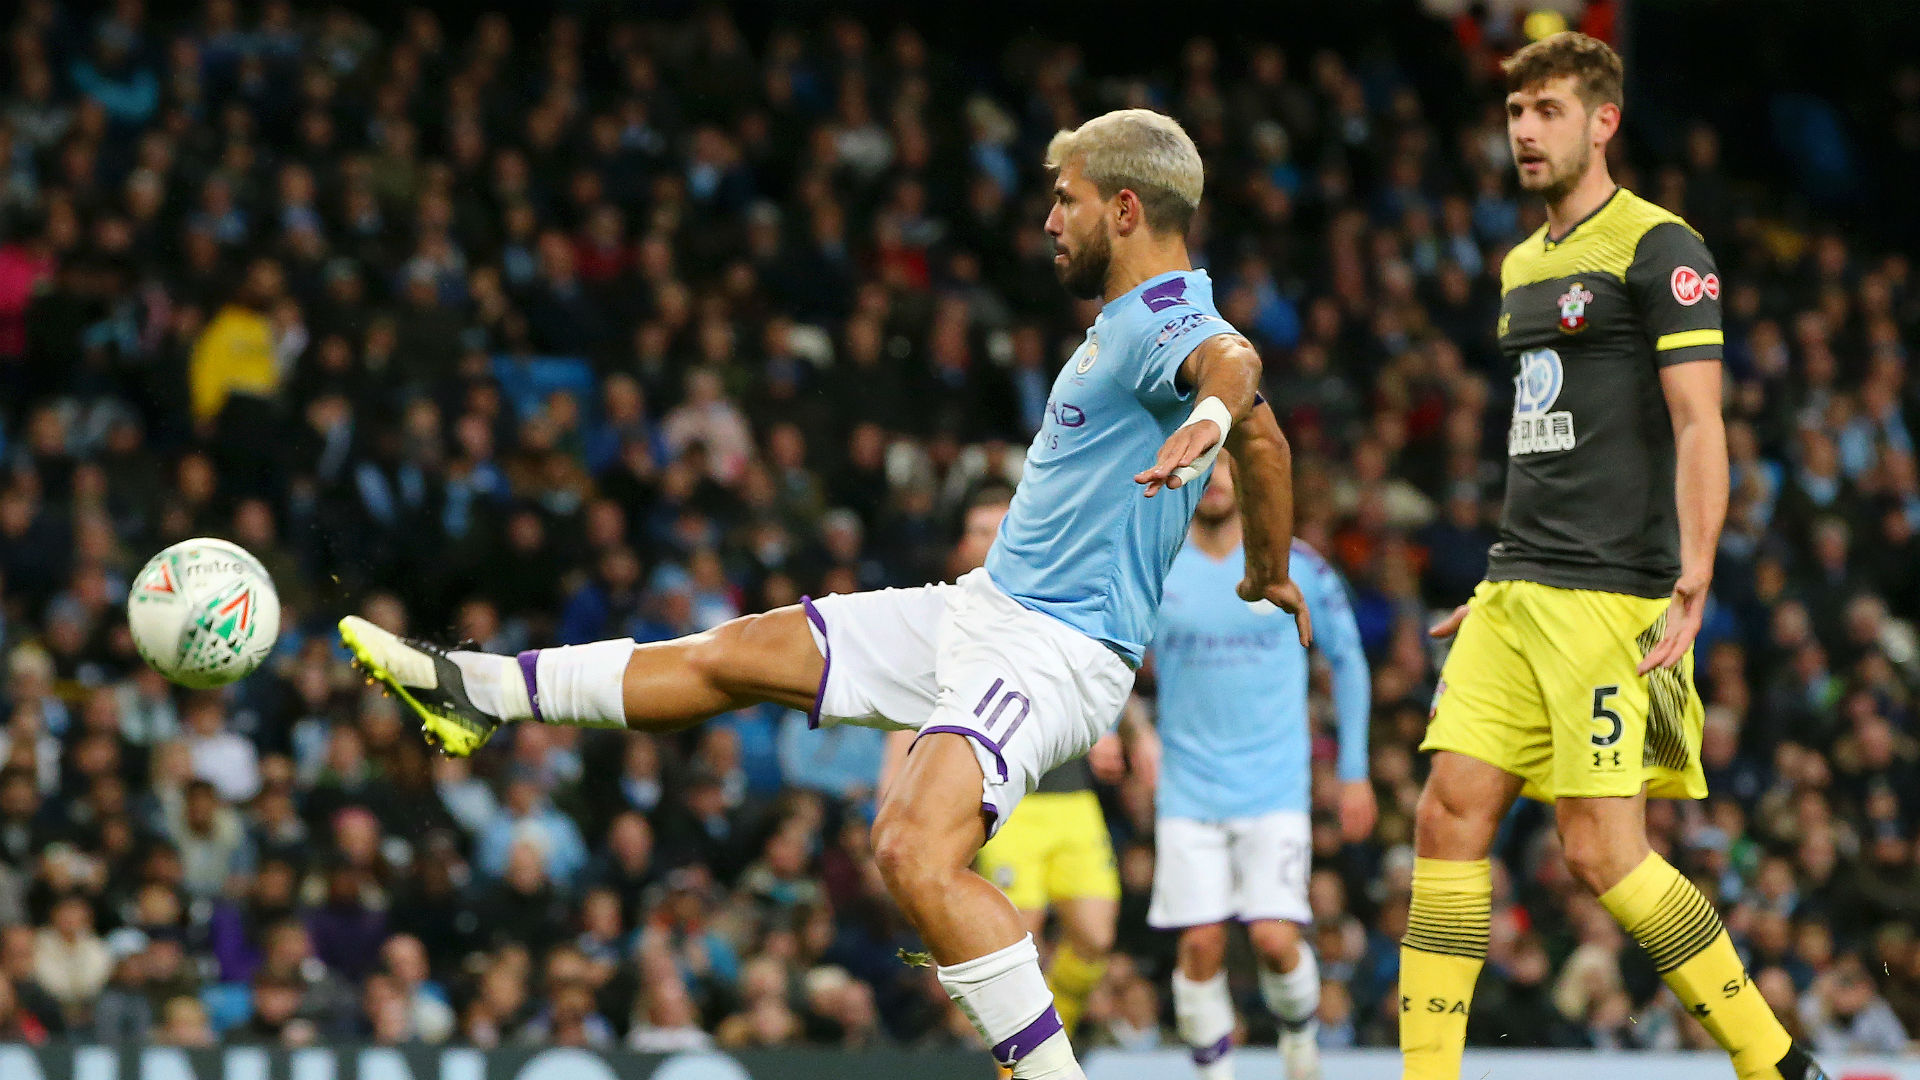 Manchester City 3-1 Southampton: Aguero double helps EFL Cup holders ease through